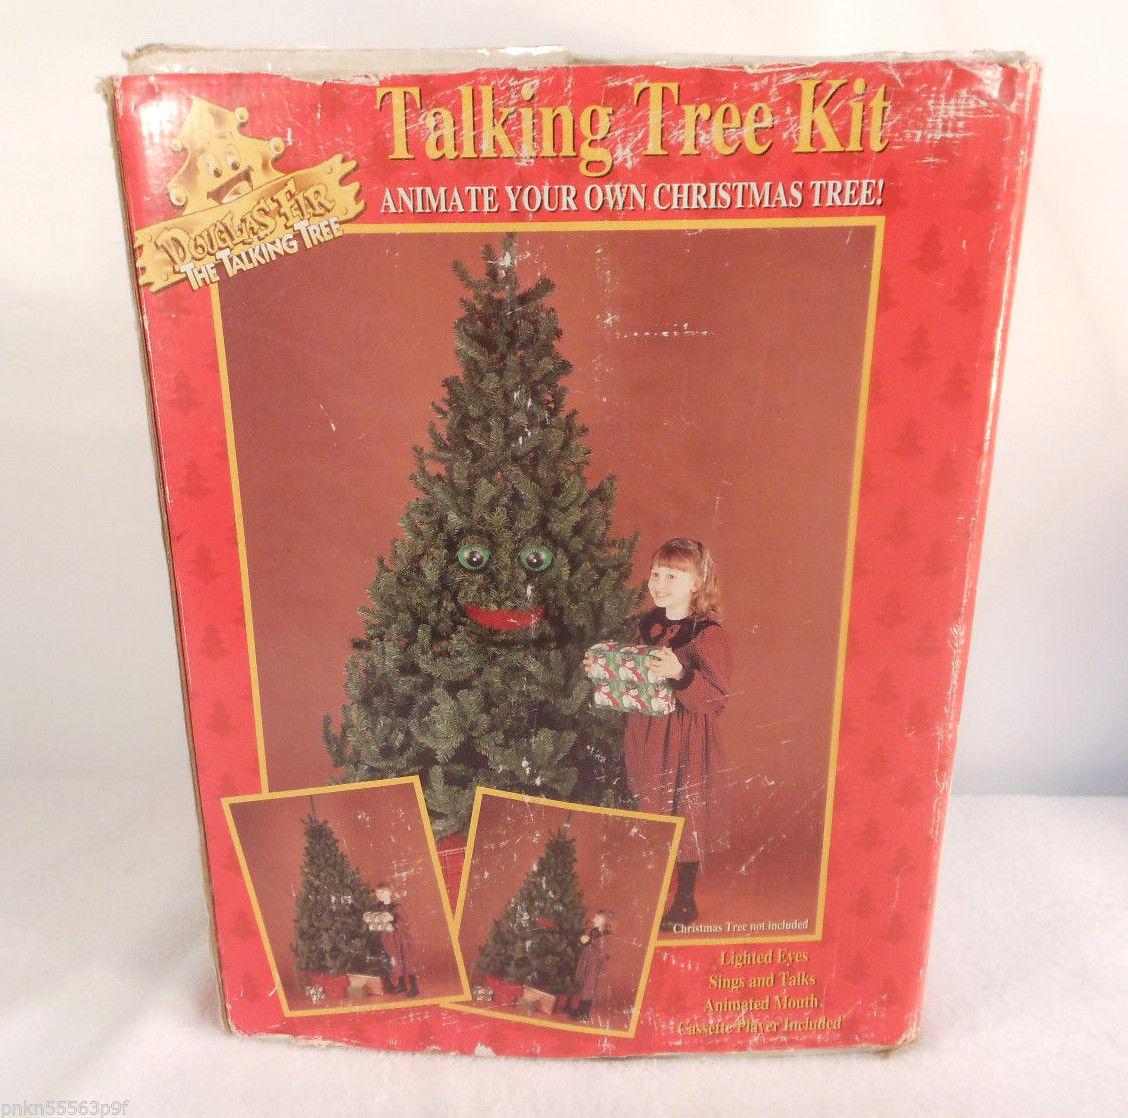 Gemmy 1996 douglas fir animated tree kit